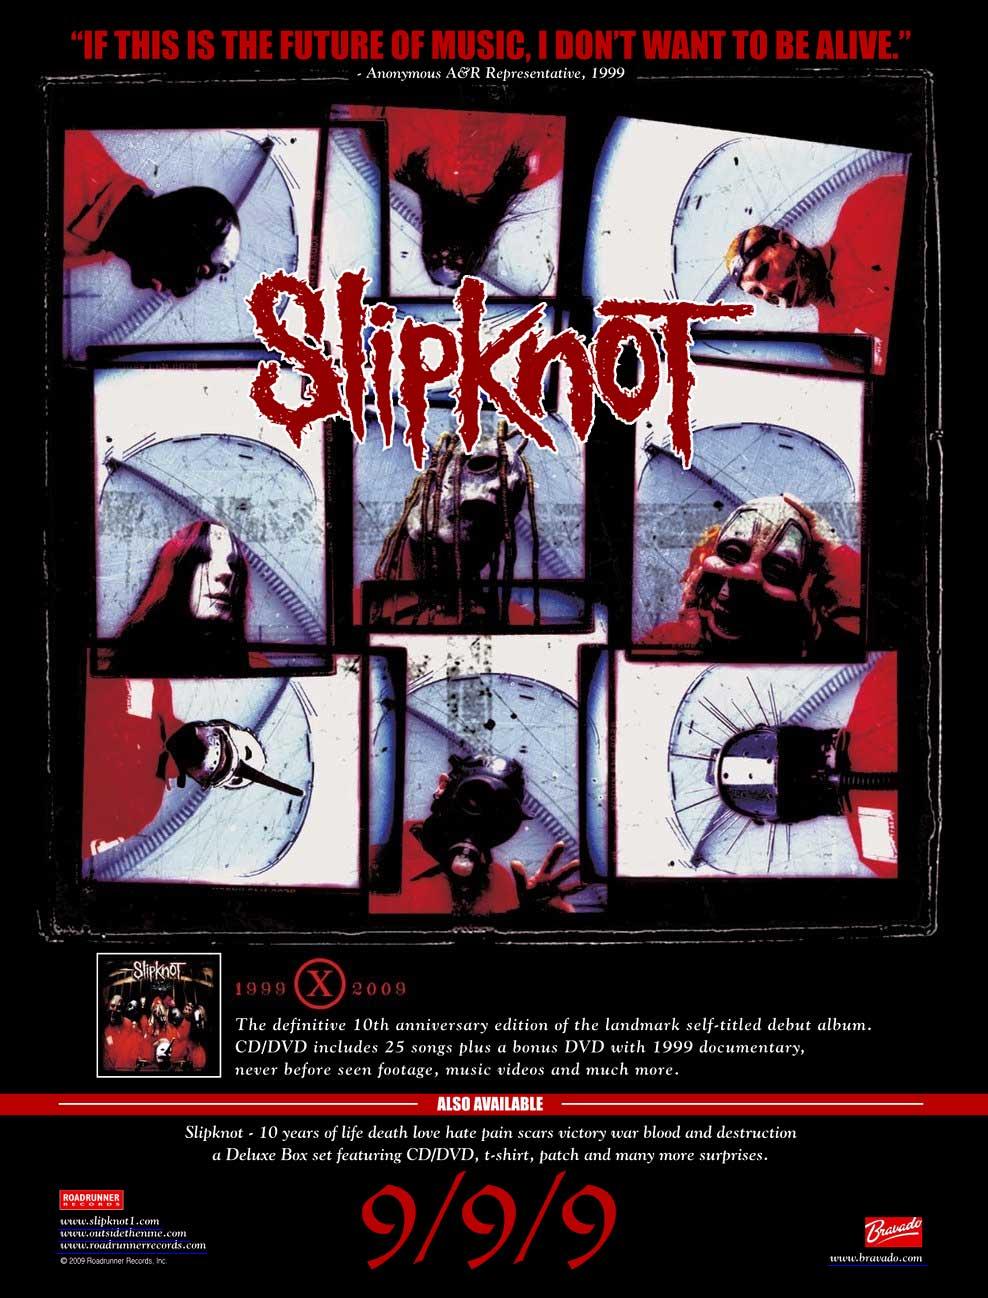 A2 Music Video Blog: Slipknot and Linkin Park album advert